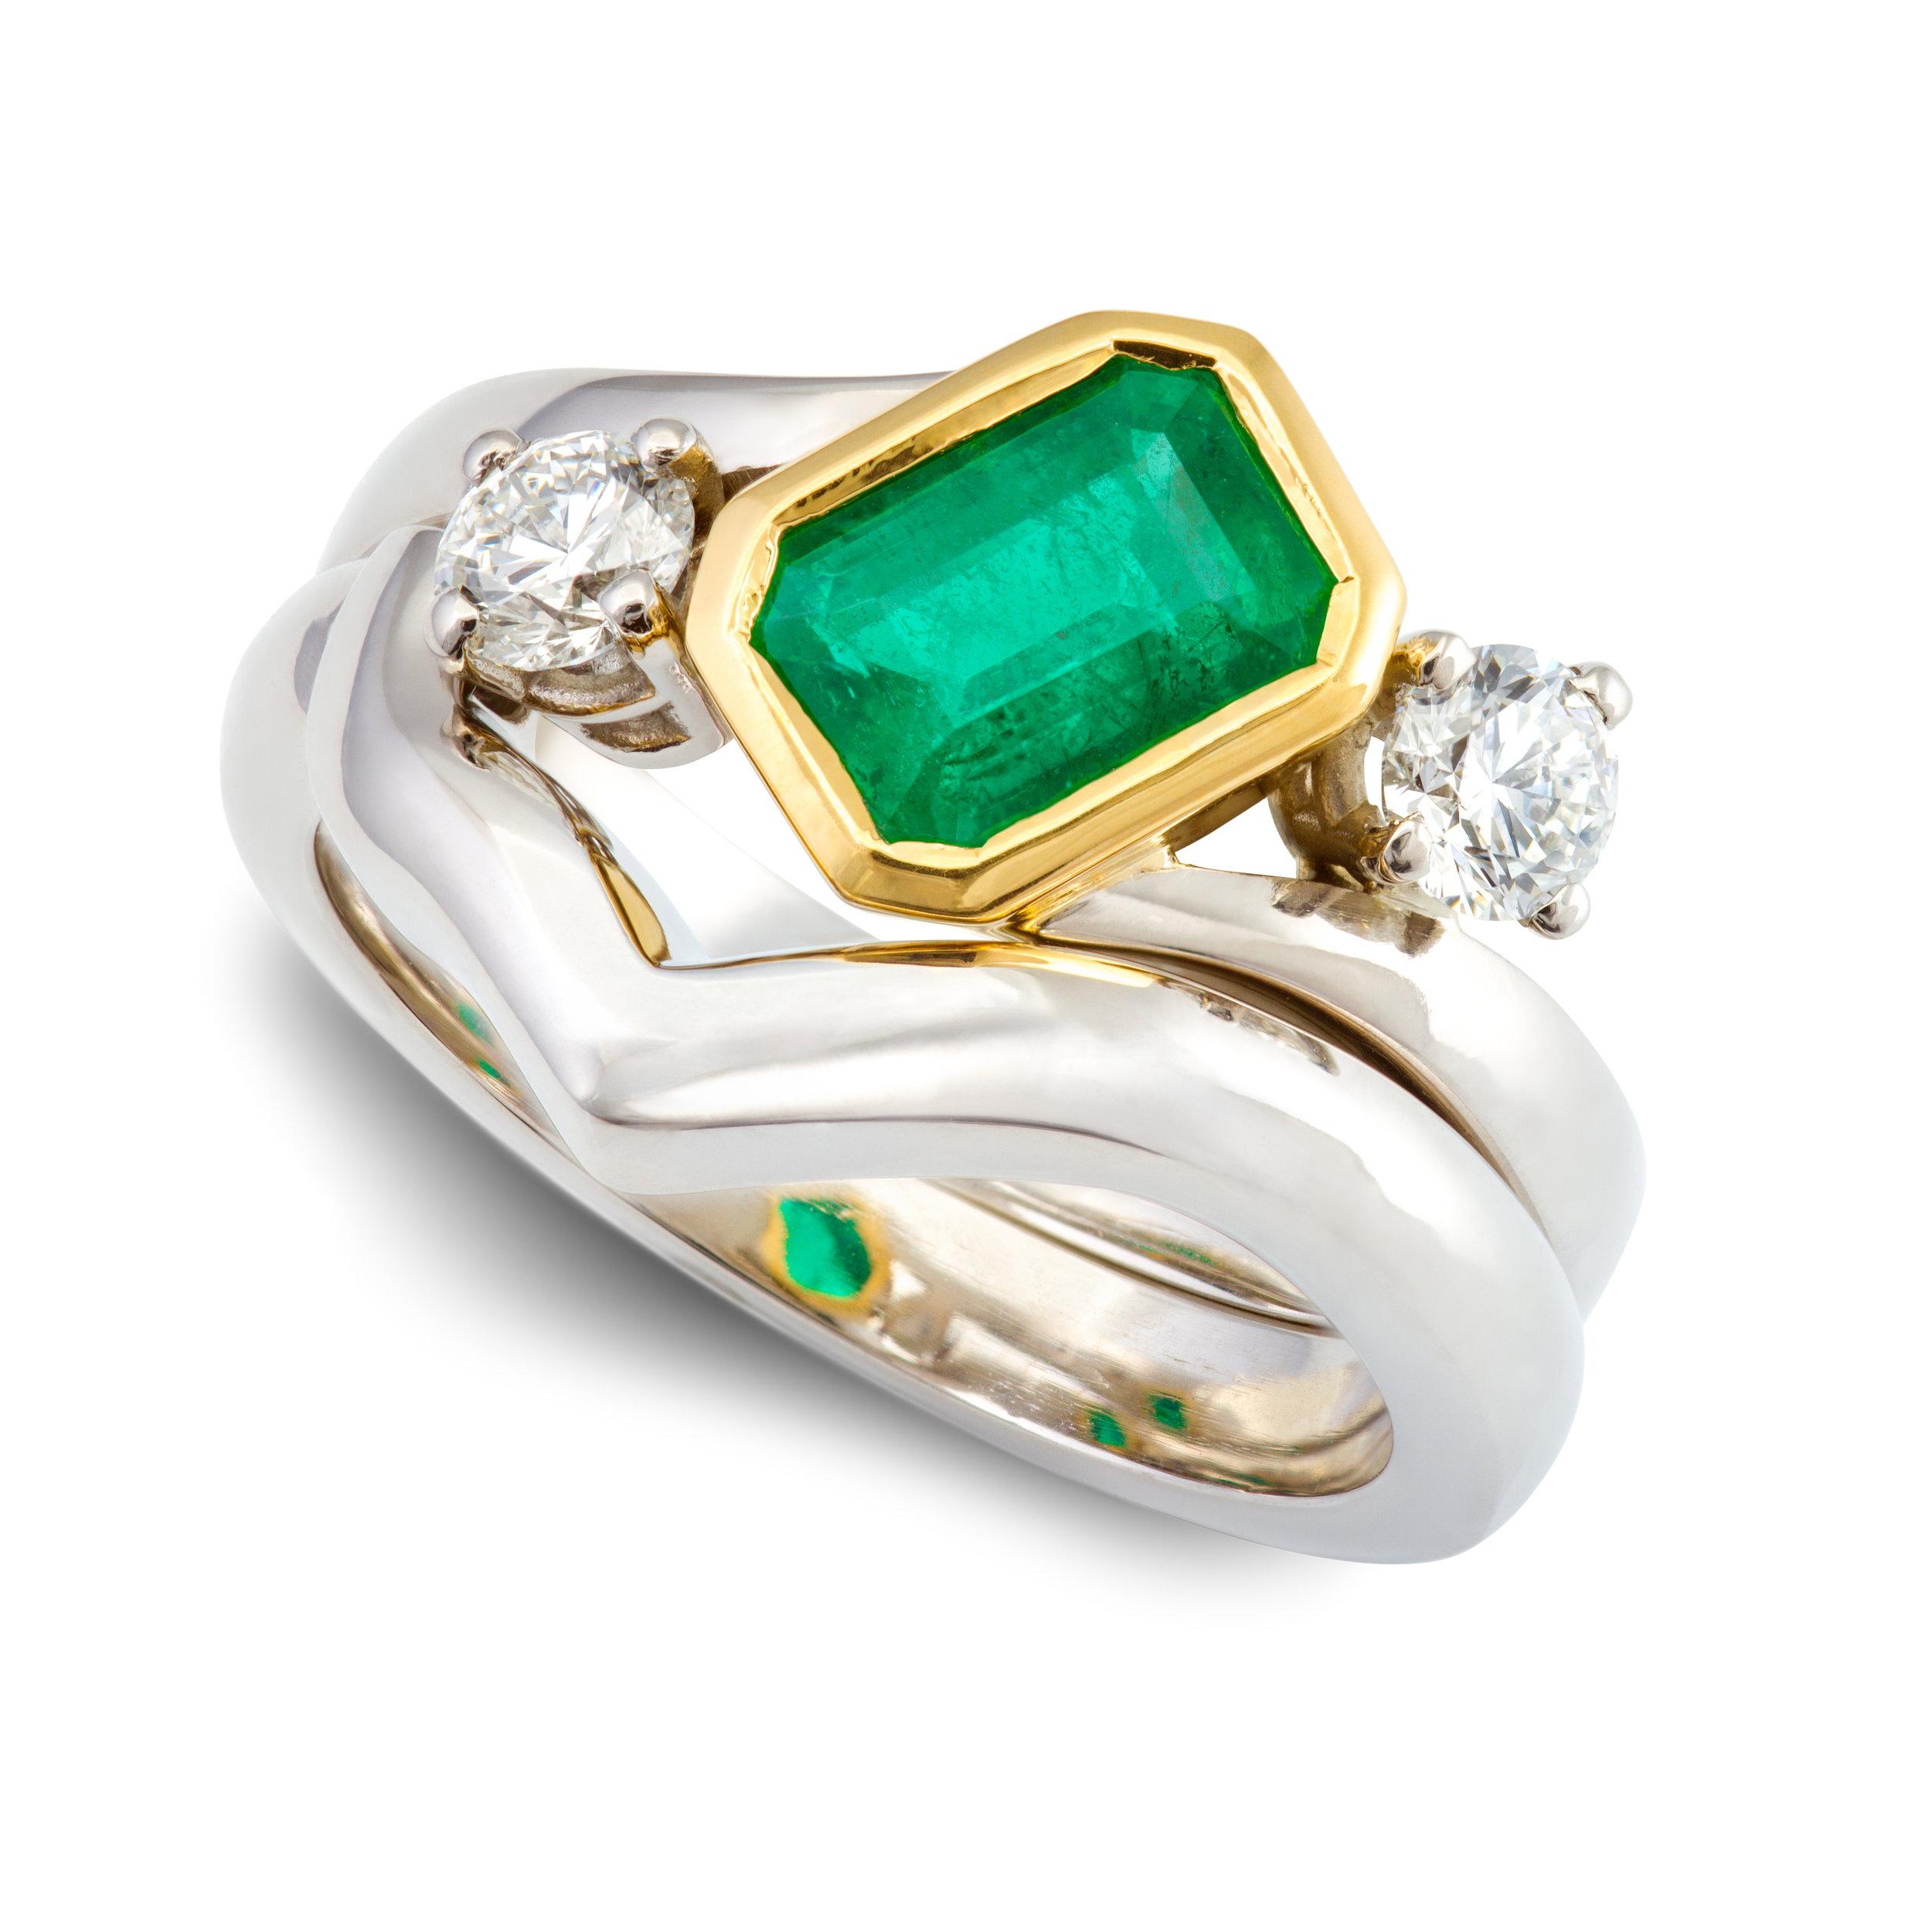 Bespoke palladium, 18ct yellow gold, emerald and diamond engagement and wedding ring commission